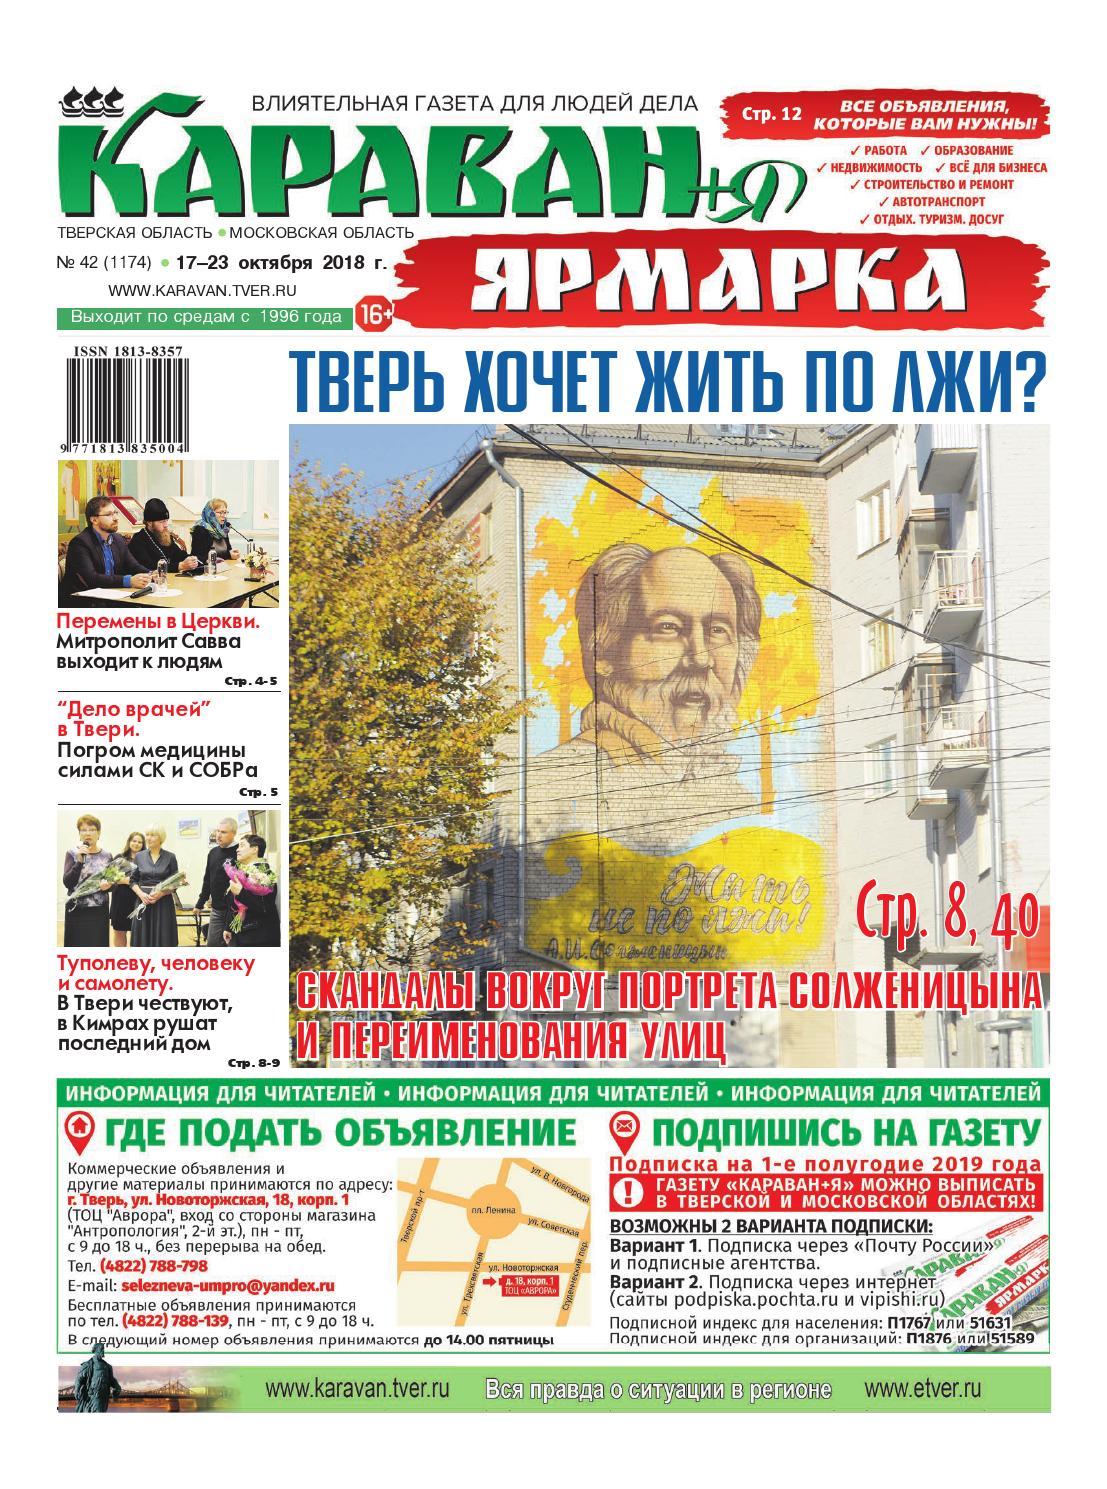 Деньги под залог недвижимости ярославль фурманова